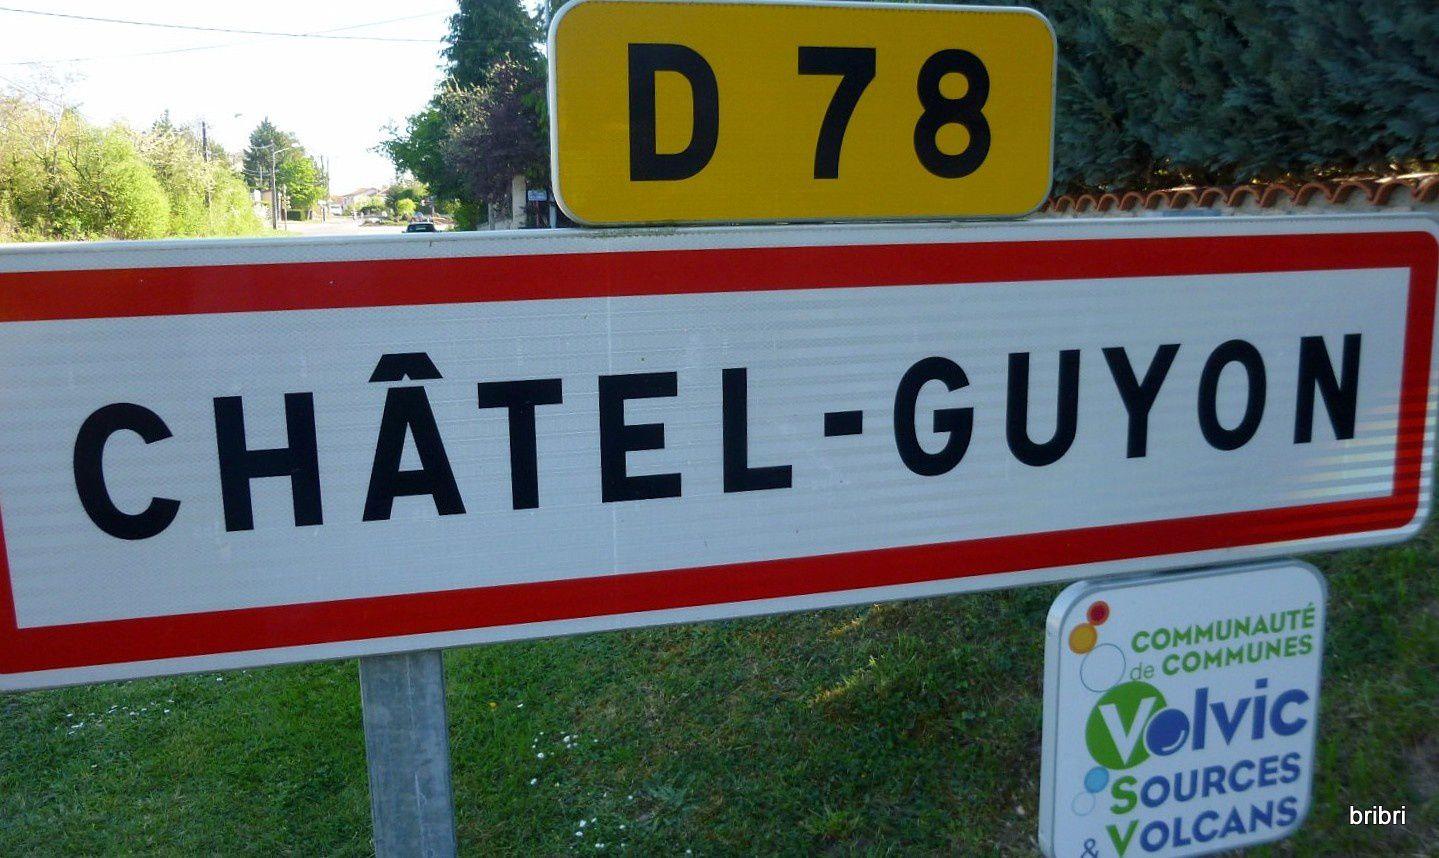 Rando à Châtel Guyon. M15.